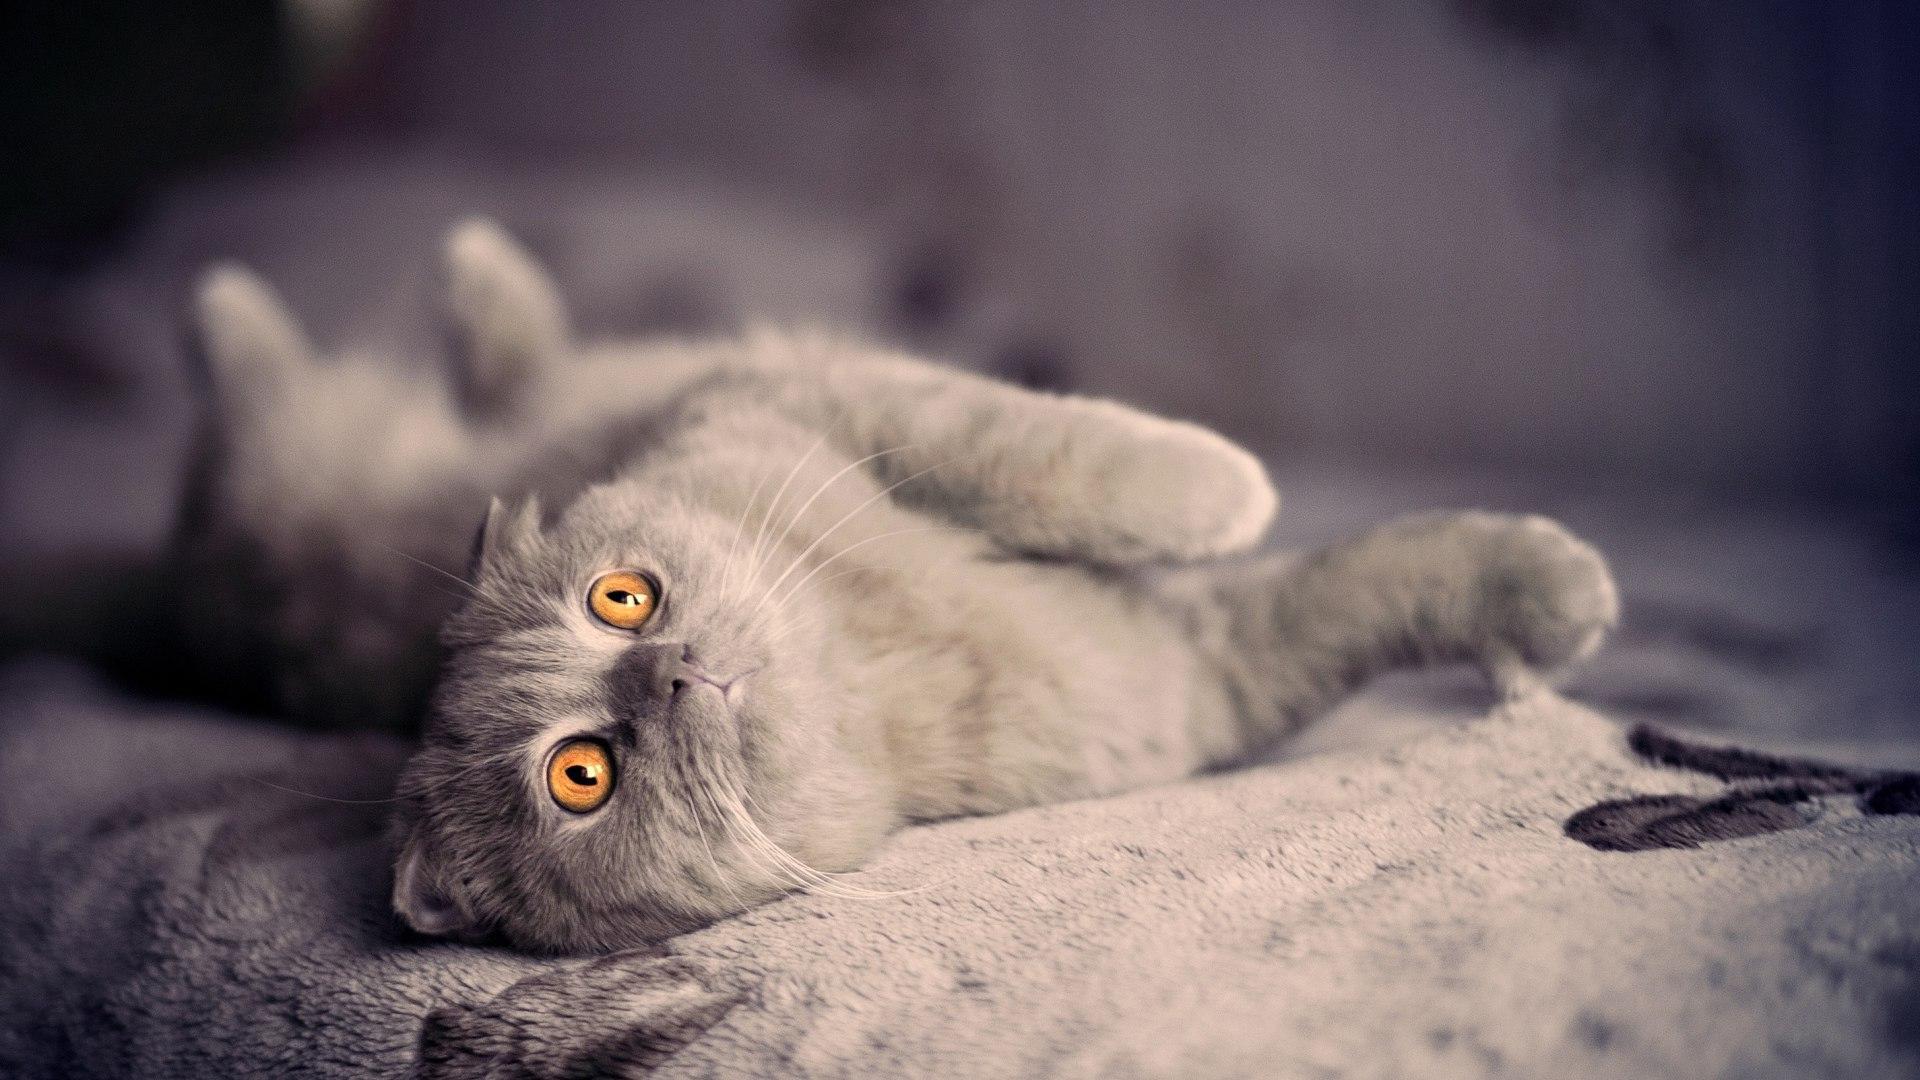 HDoboi.Kiev.ua - Шотландский вислоухий кот, заставка на айфон животные